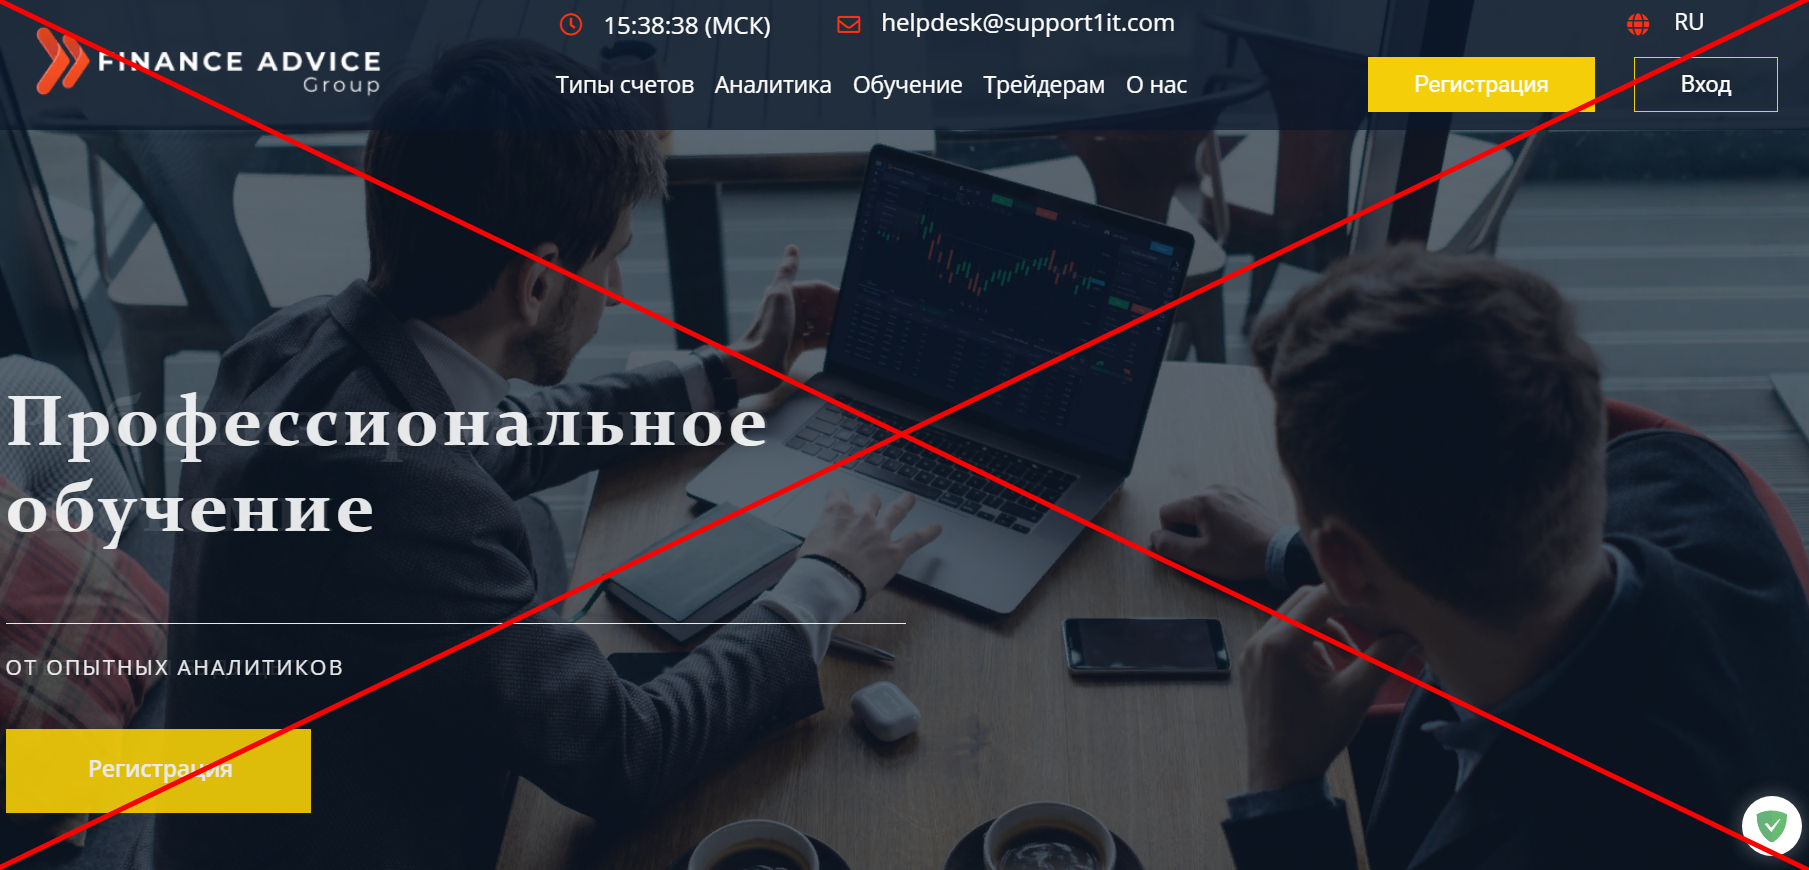 Finance Advice Group